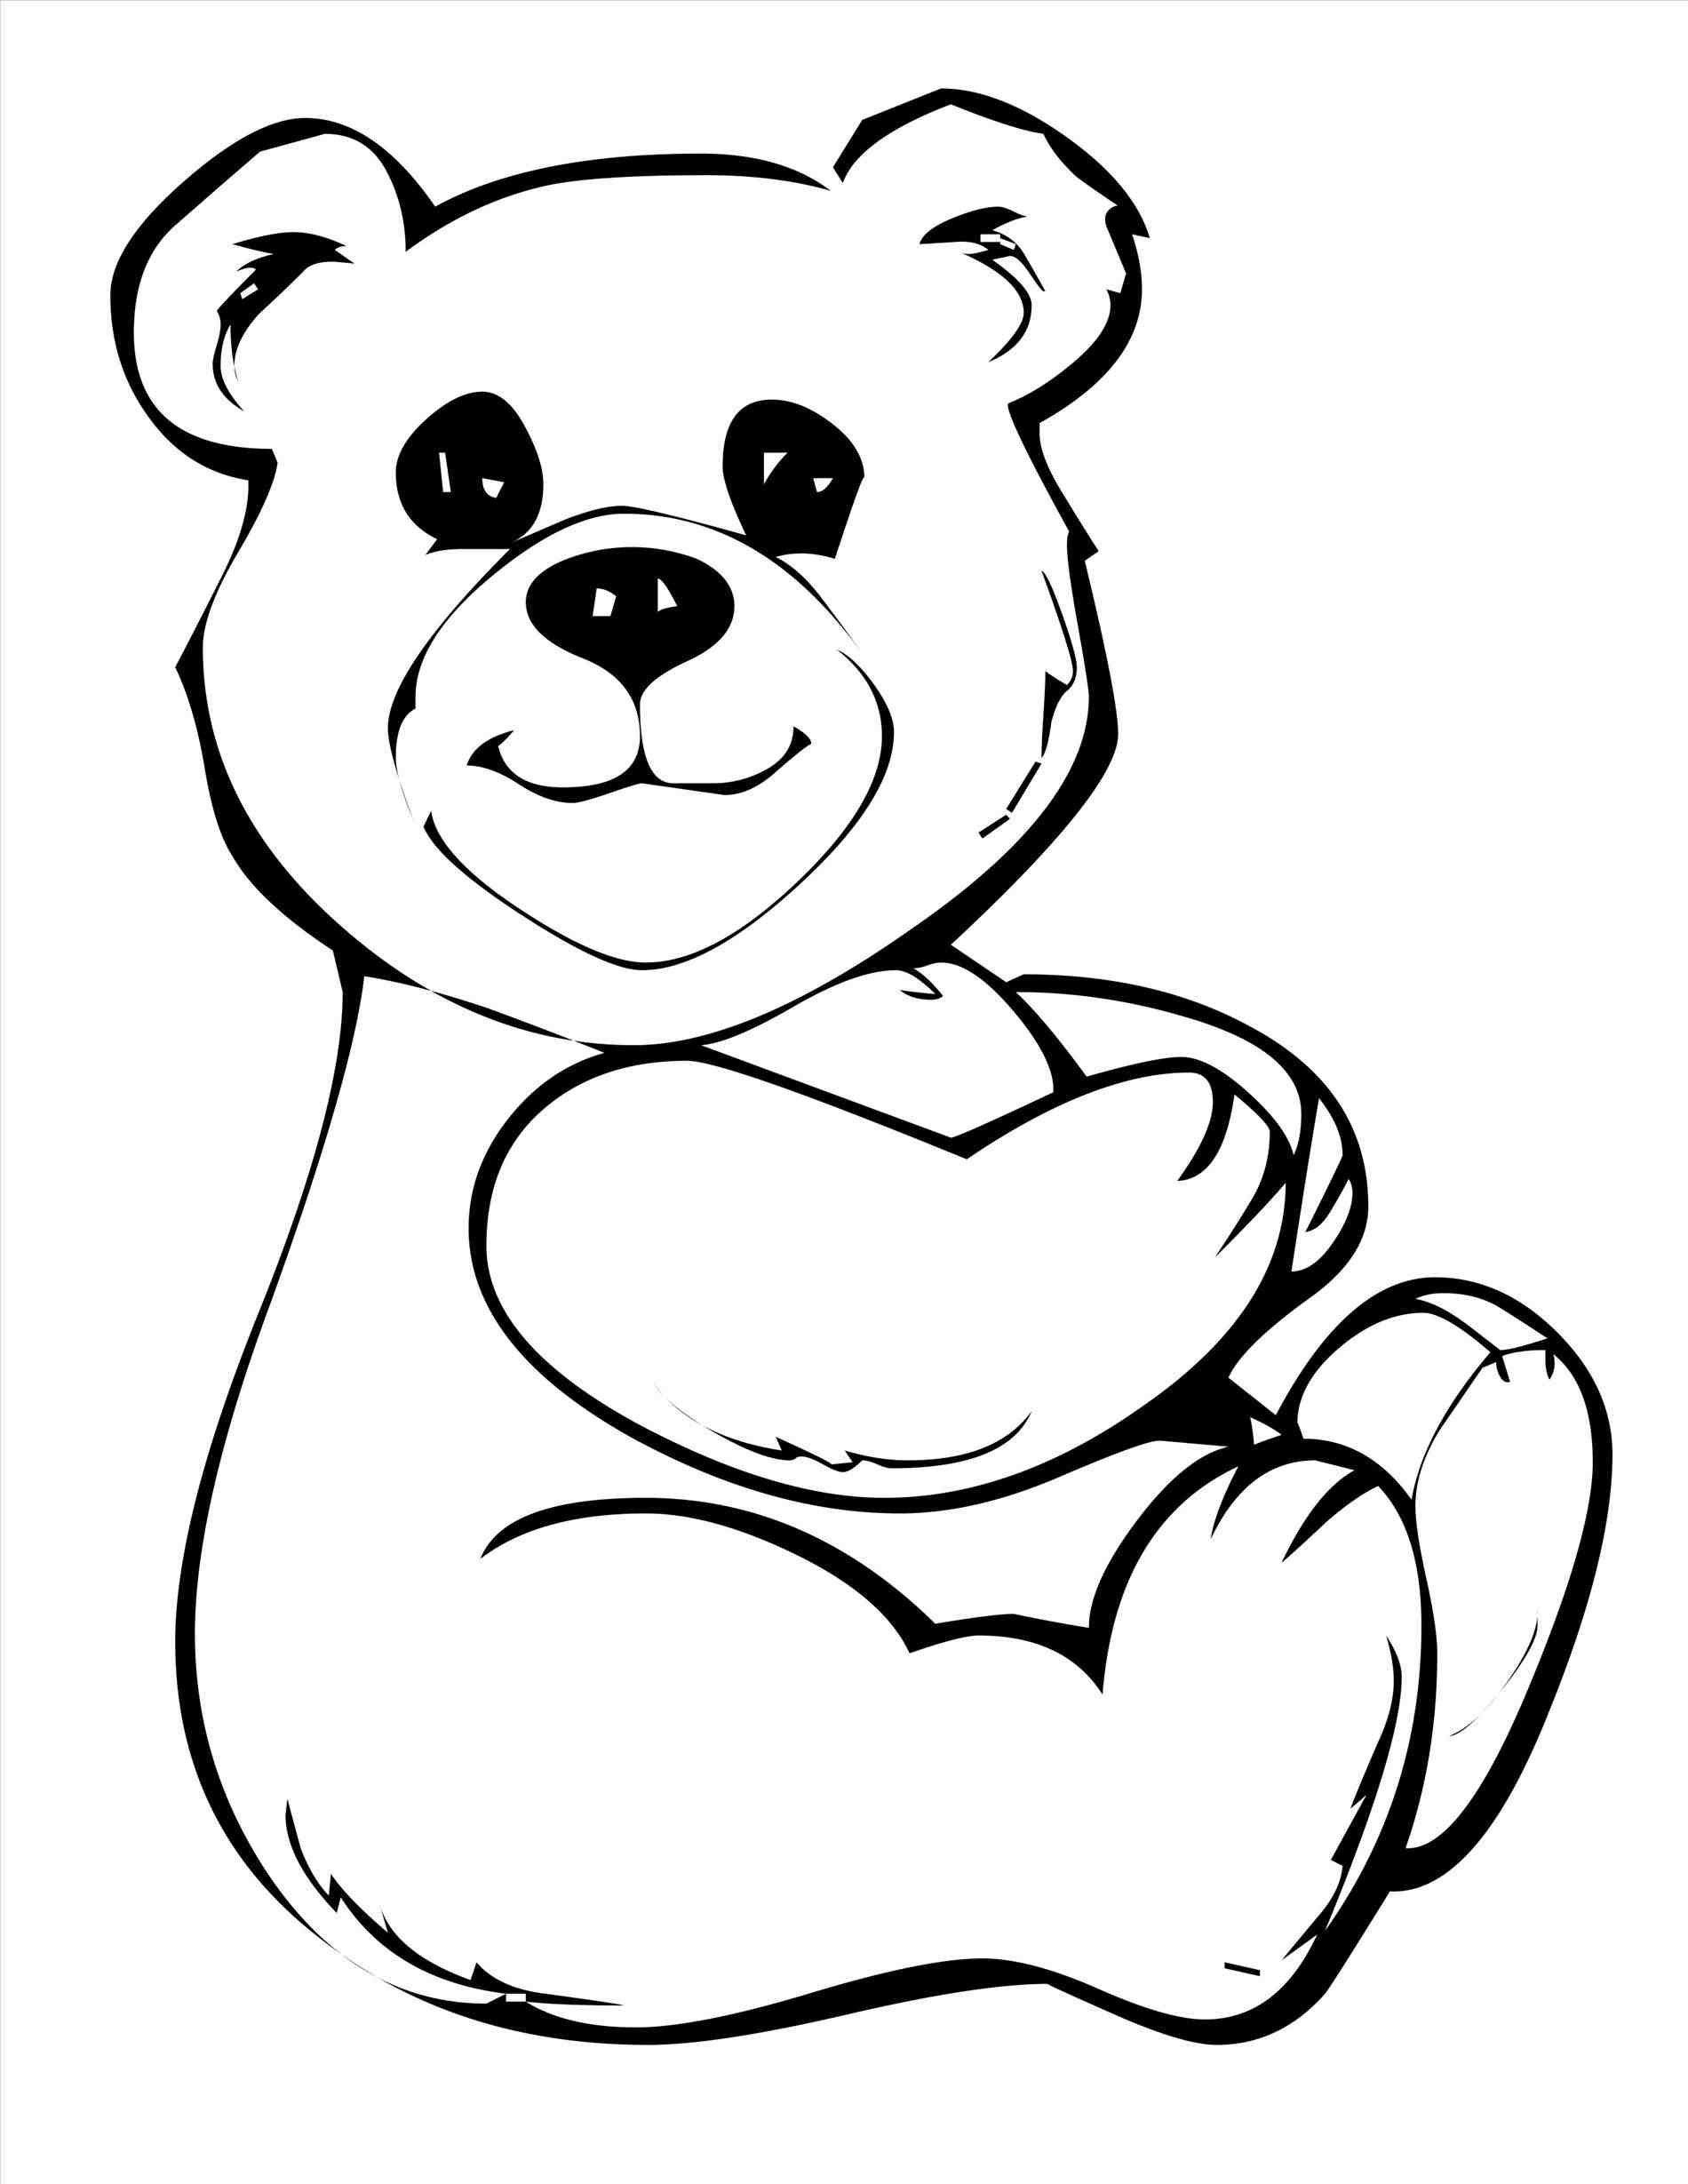 1900x2458 Teddy Bear Mask Templates Print Out. Valentine Ideas How